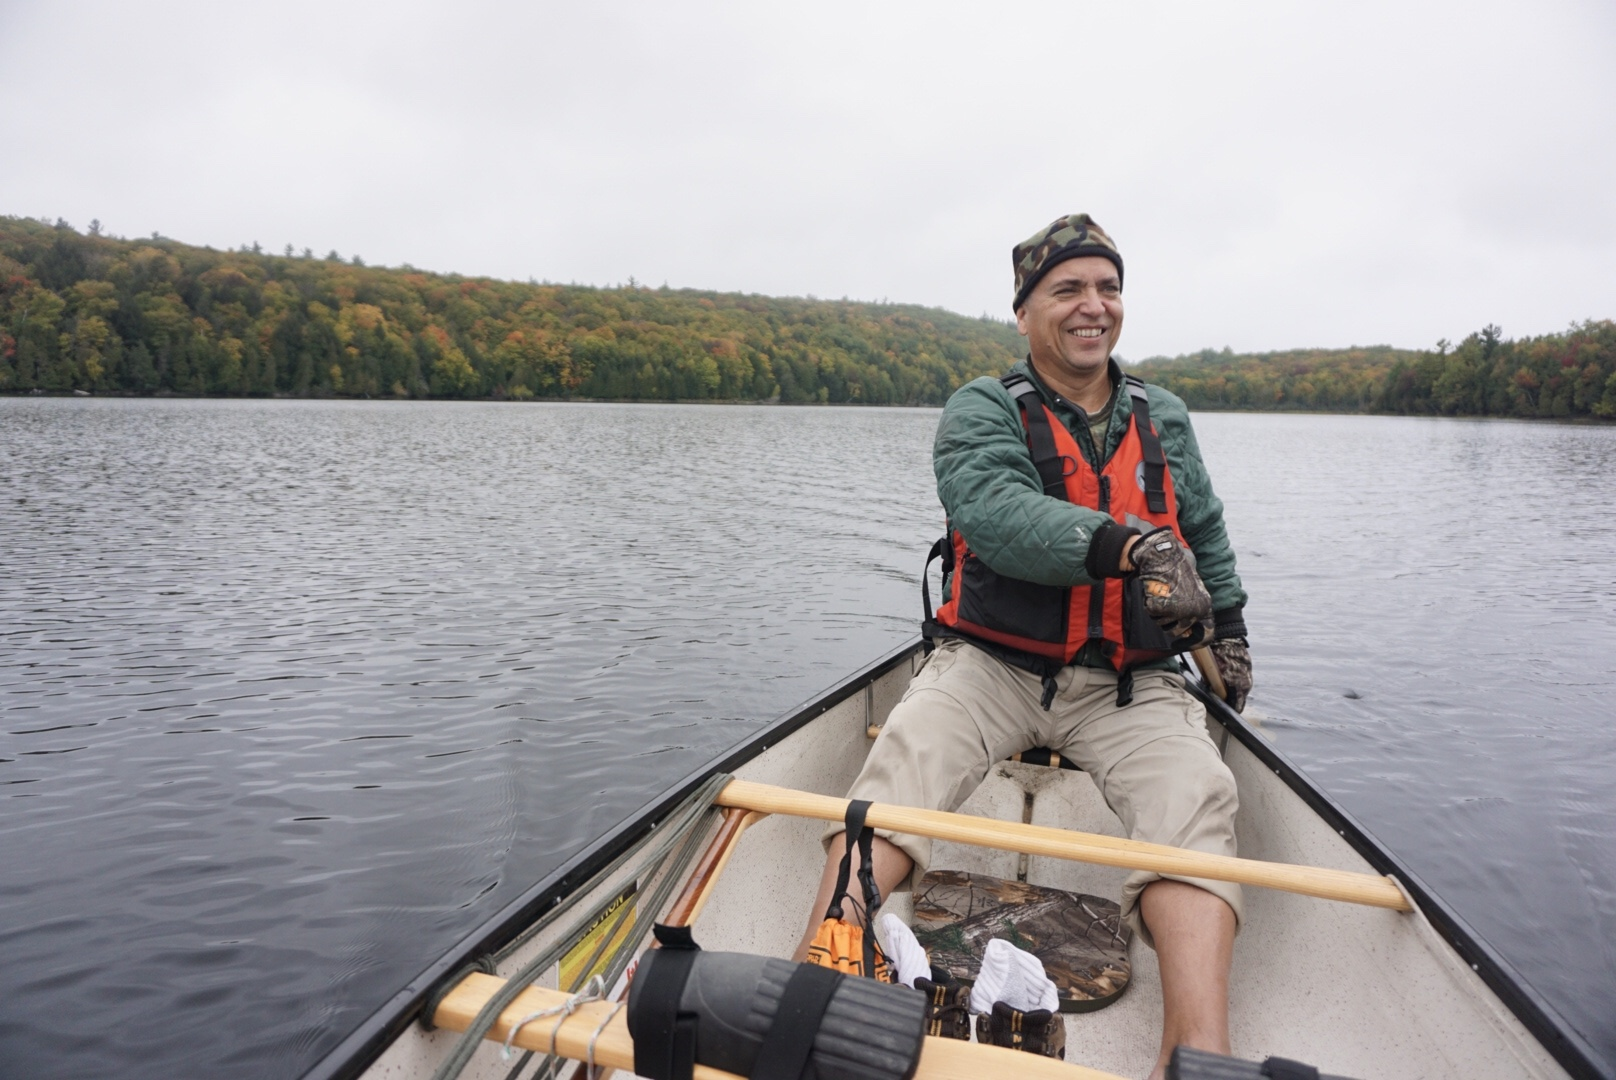 Hayley's Dad paddling